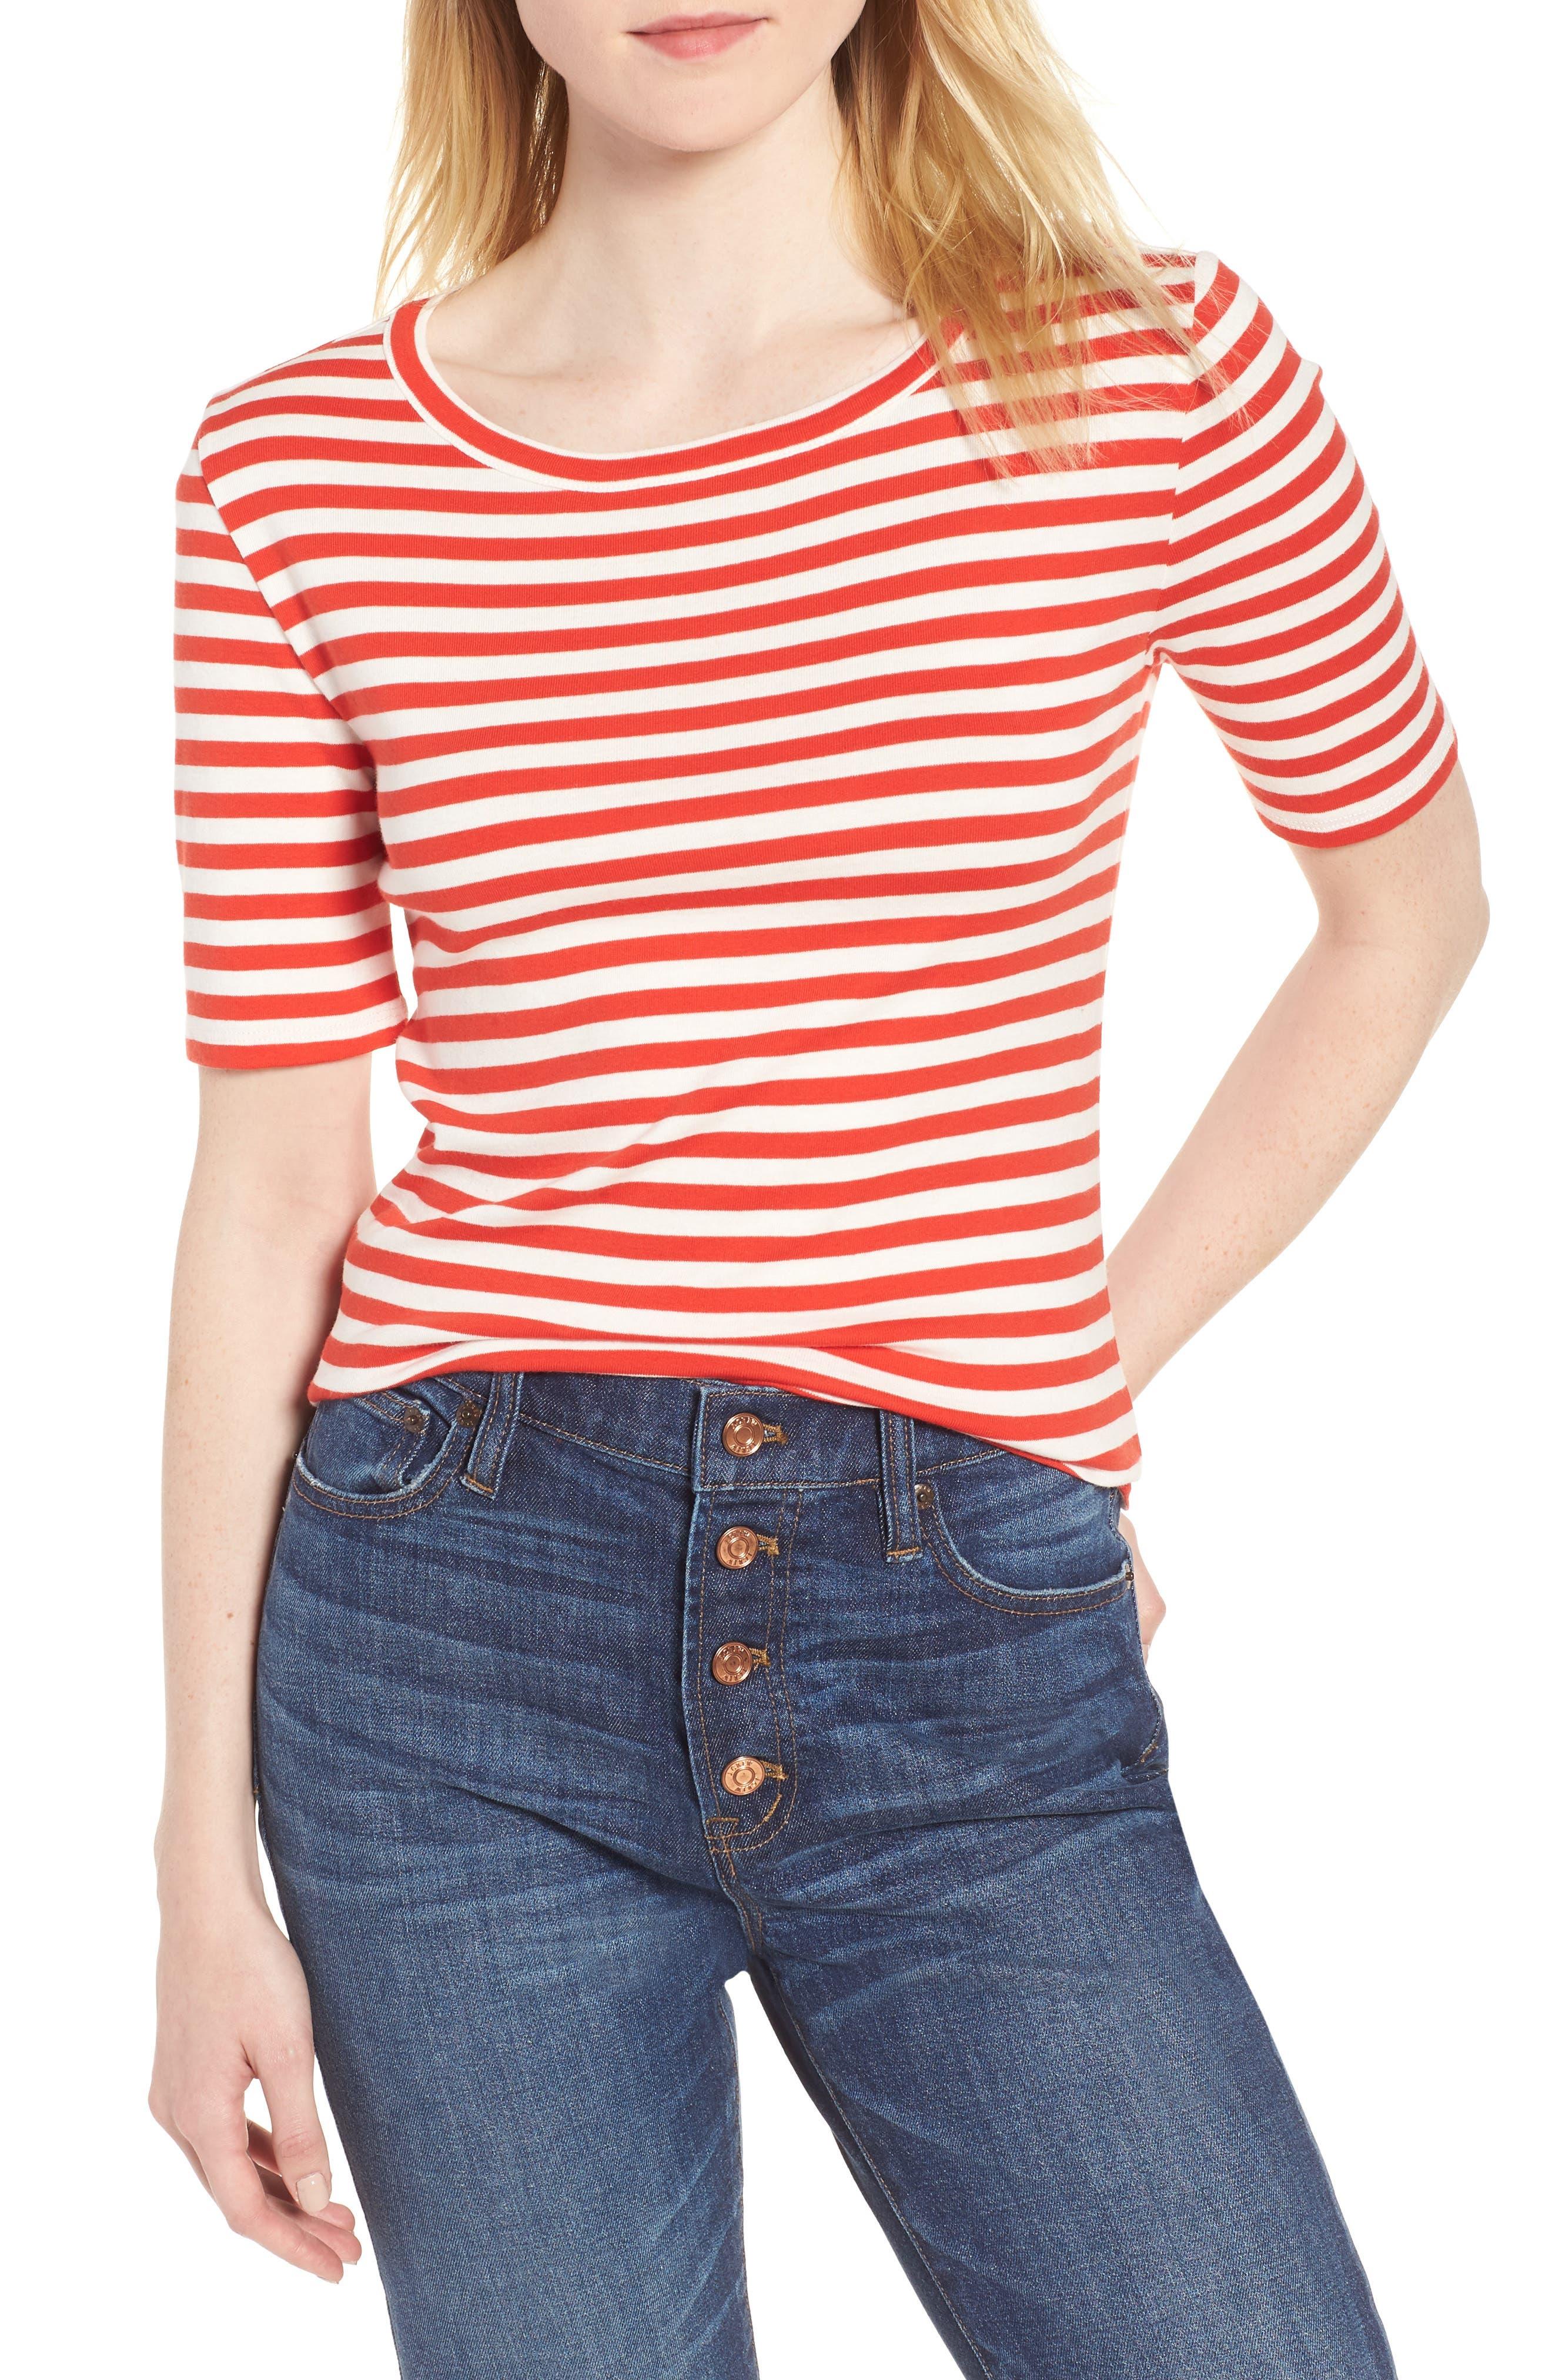 New Perfect Fit T-Shirt,                             Main thumbnail 1, color,                             Ivory Vivid Flame